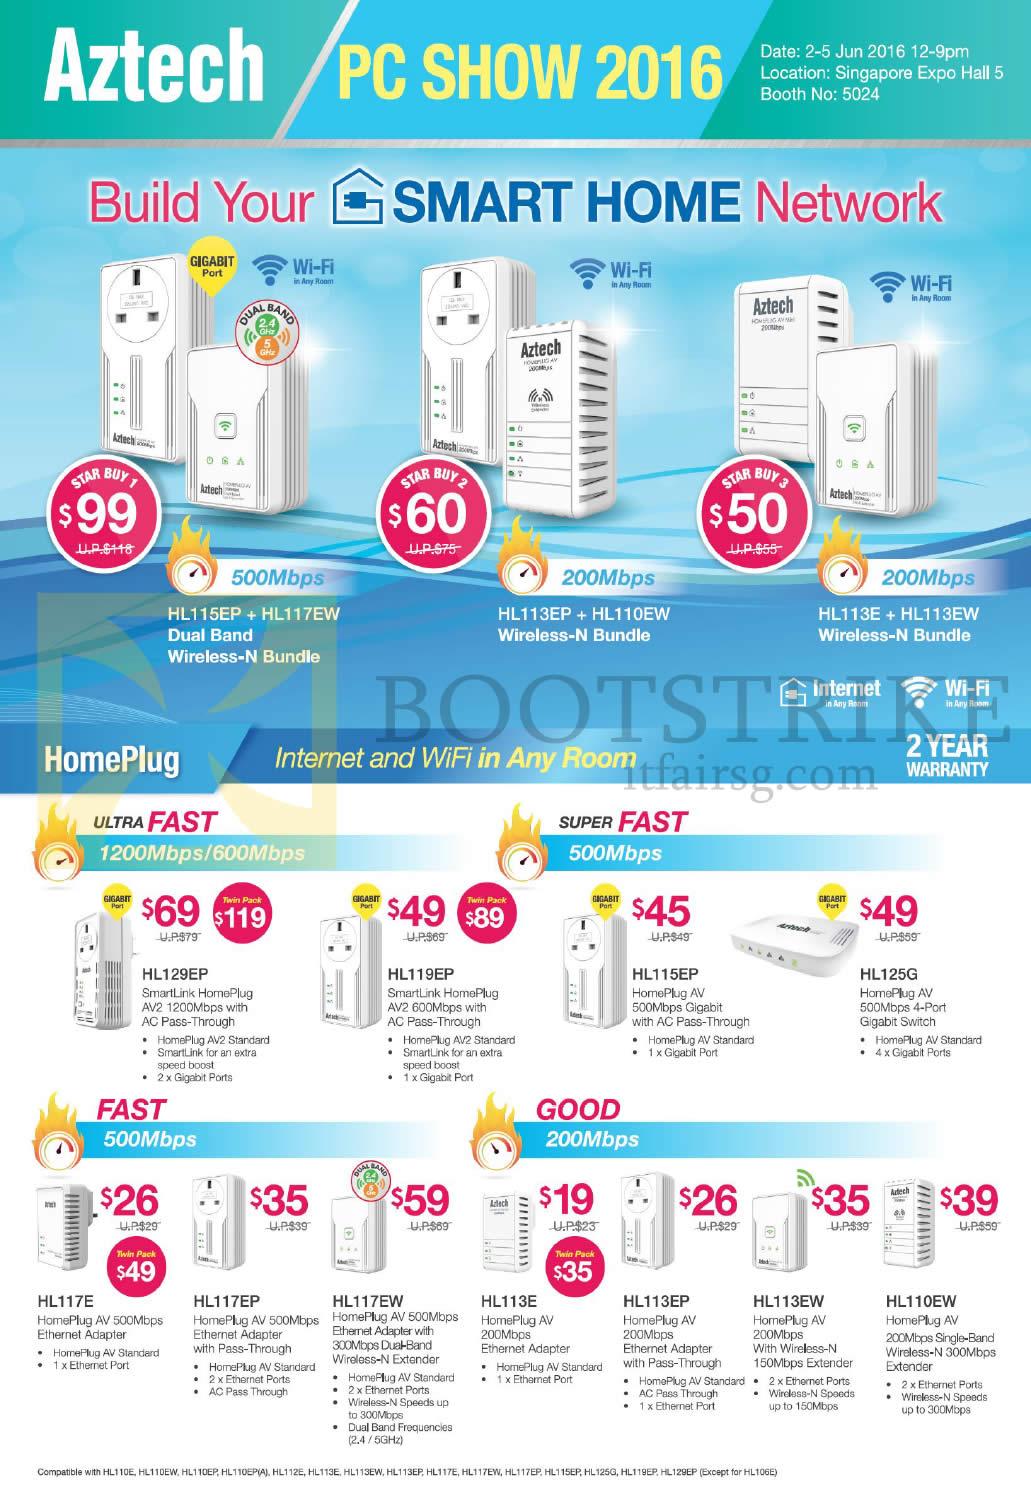 PC SHOW 2016 price list image brochure of Aztech Networking Homeplug, HL129EP, 119EP, 115EP, 125G, 117E, 117EP, 117EW, 113E, 113EP, 113EW, 110EW